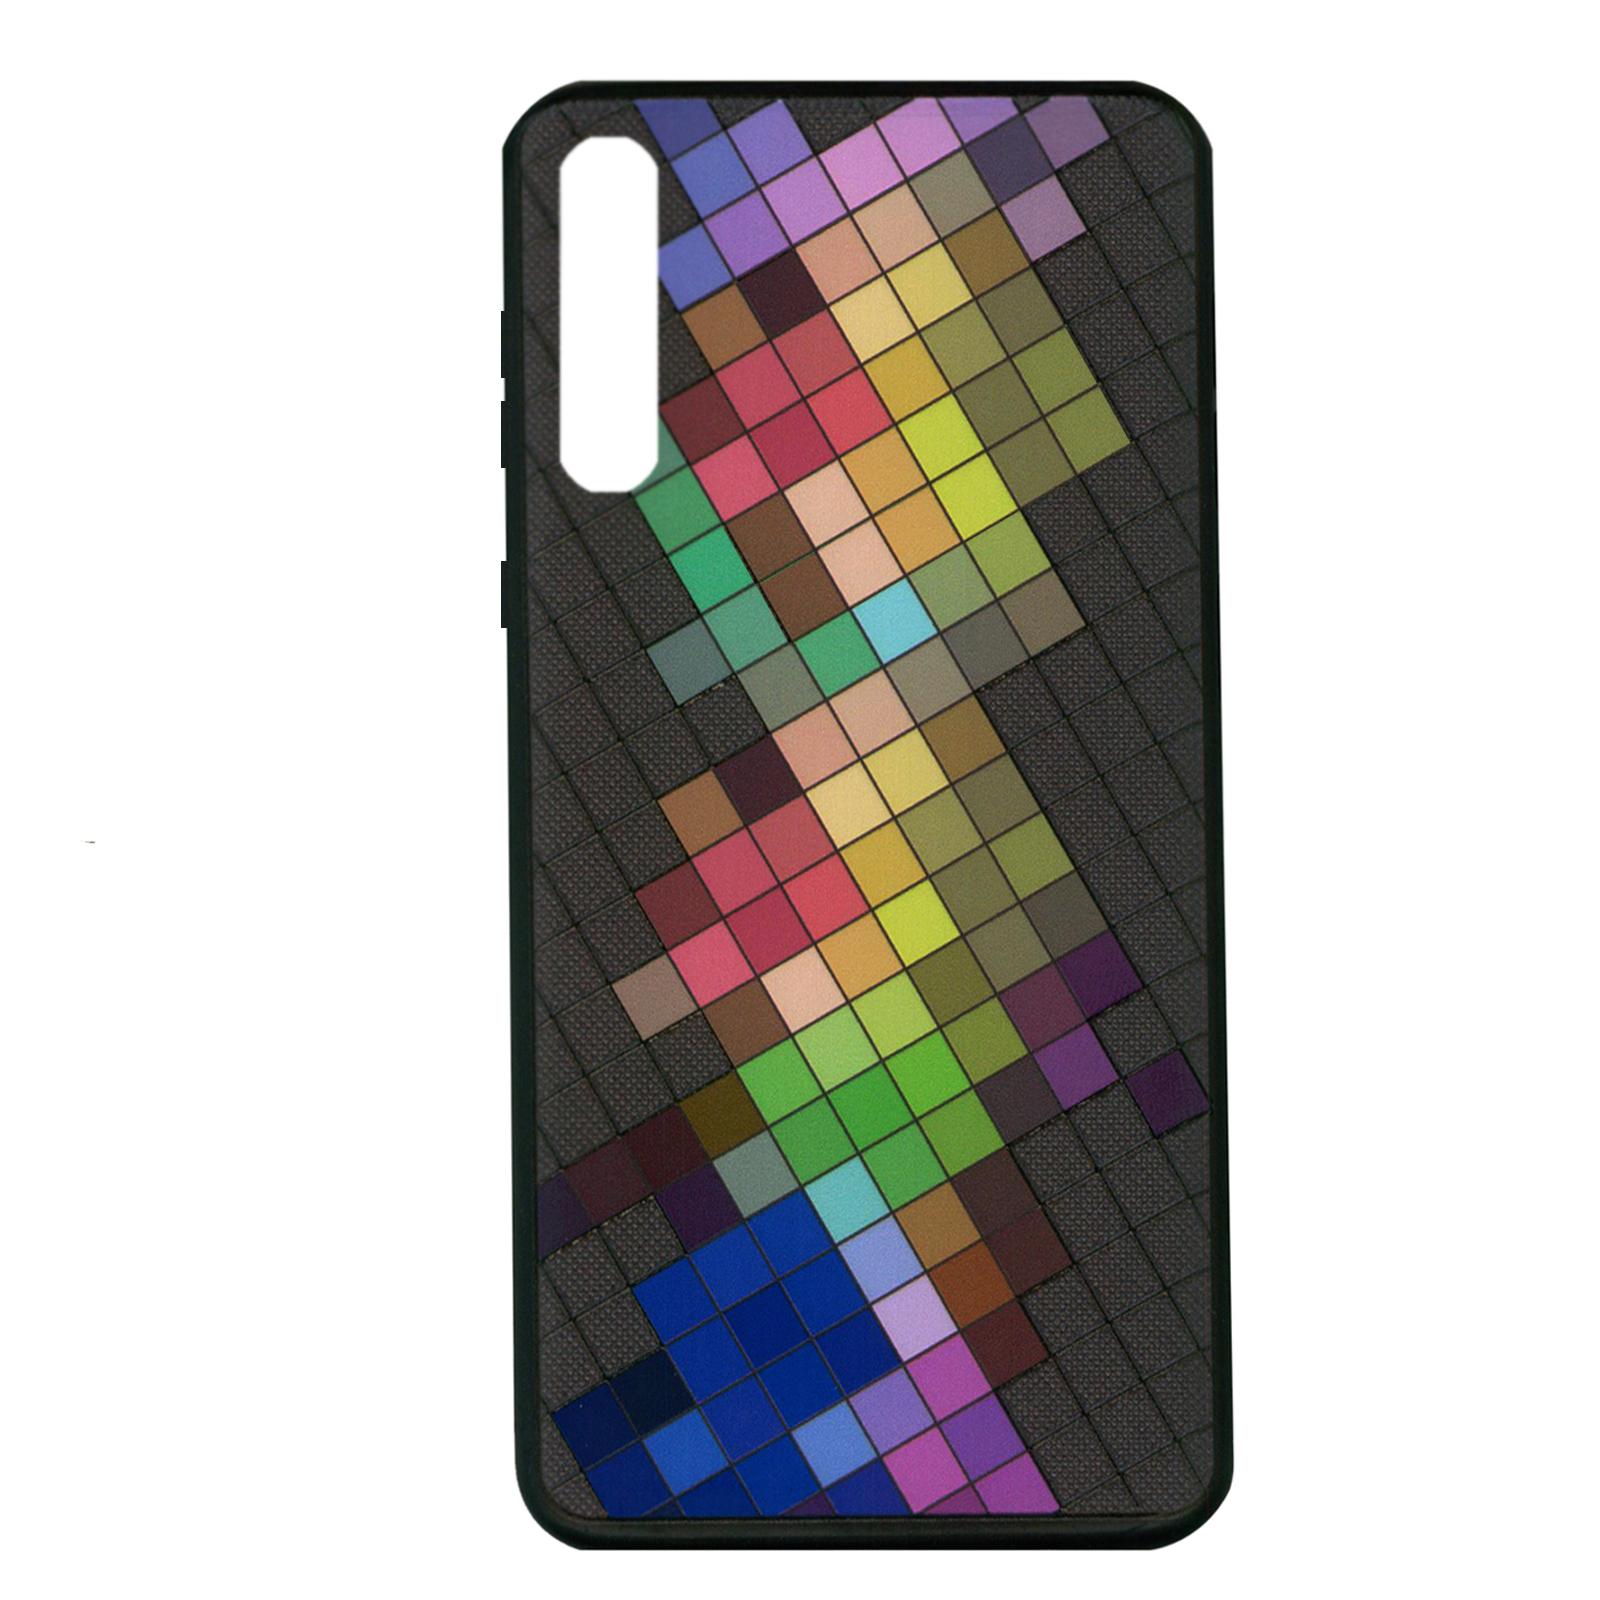 کاور کد 709 مناسب برای گوشی موبایل سامسونگ Galaxy A50 / A50S / A30S